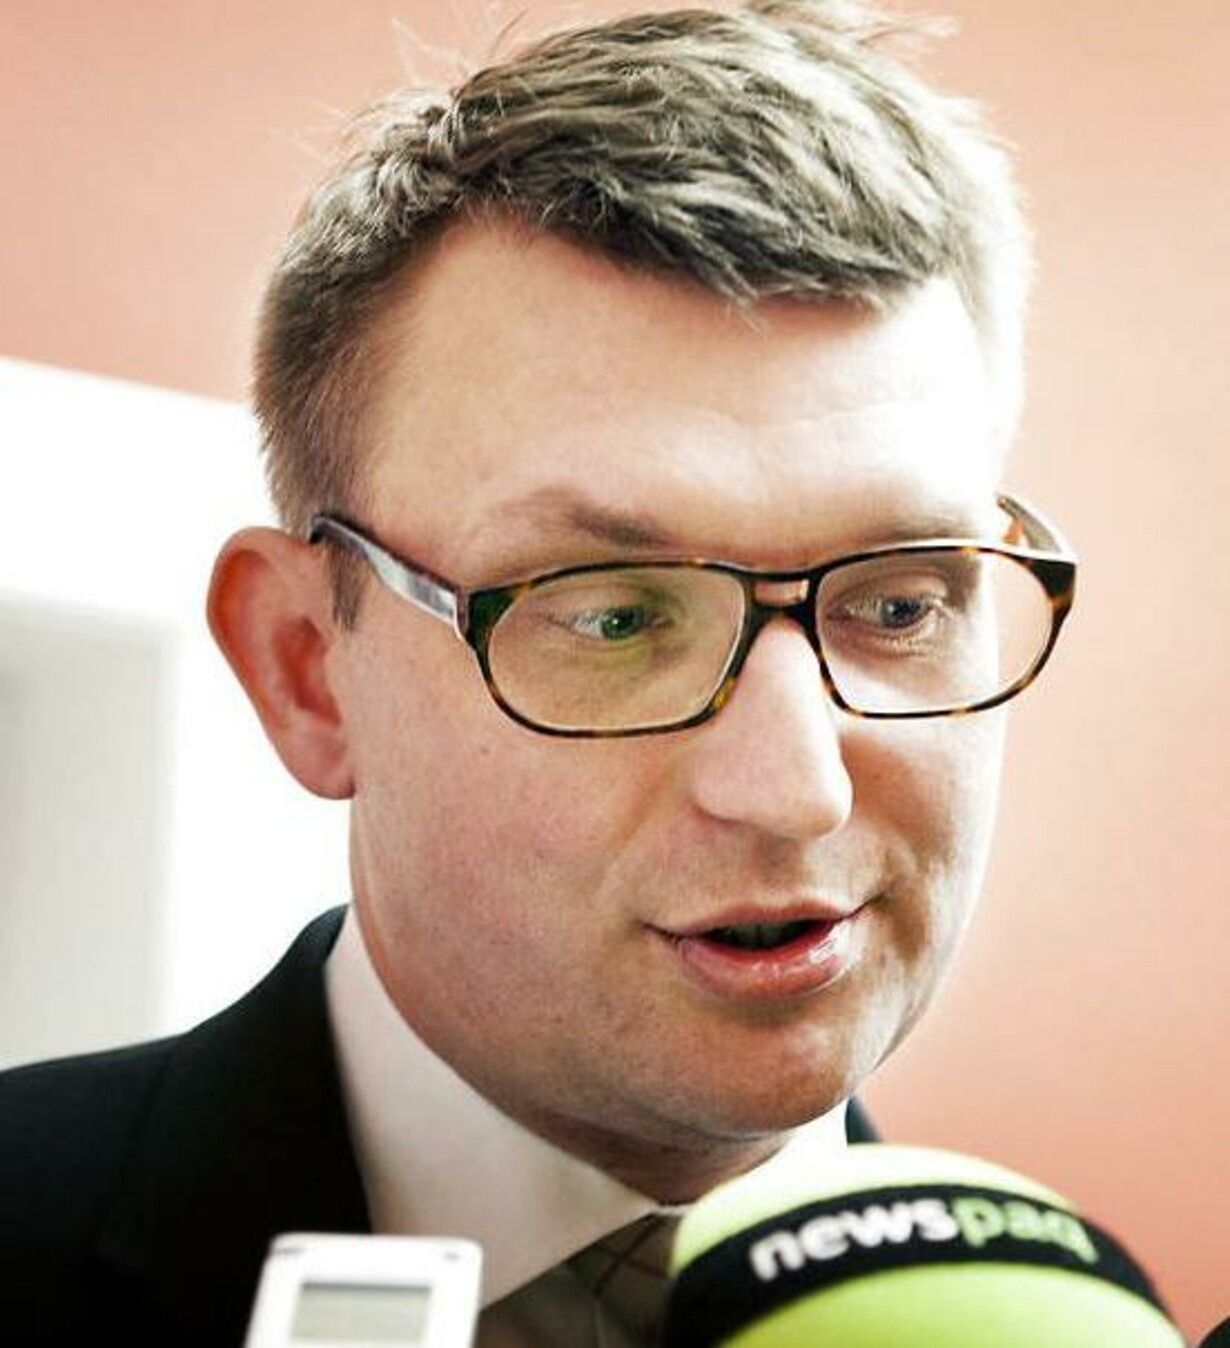 Avis: Troels Lund brugte sin private mail i skattesag